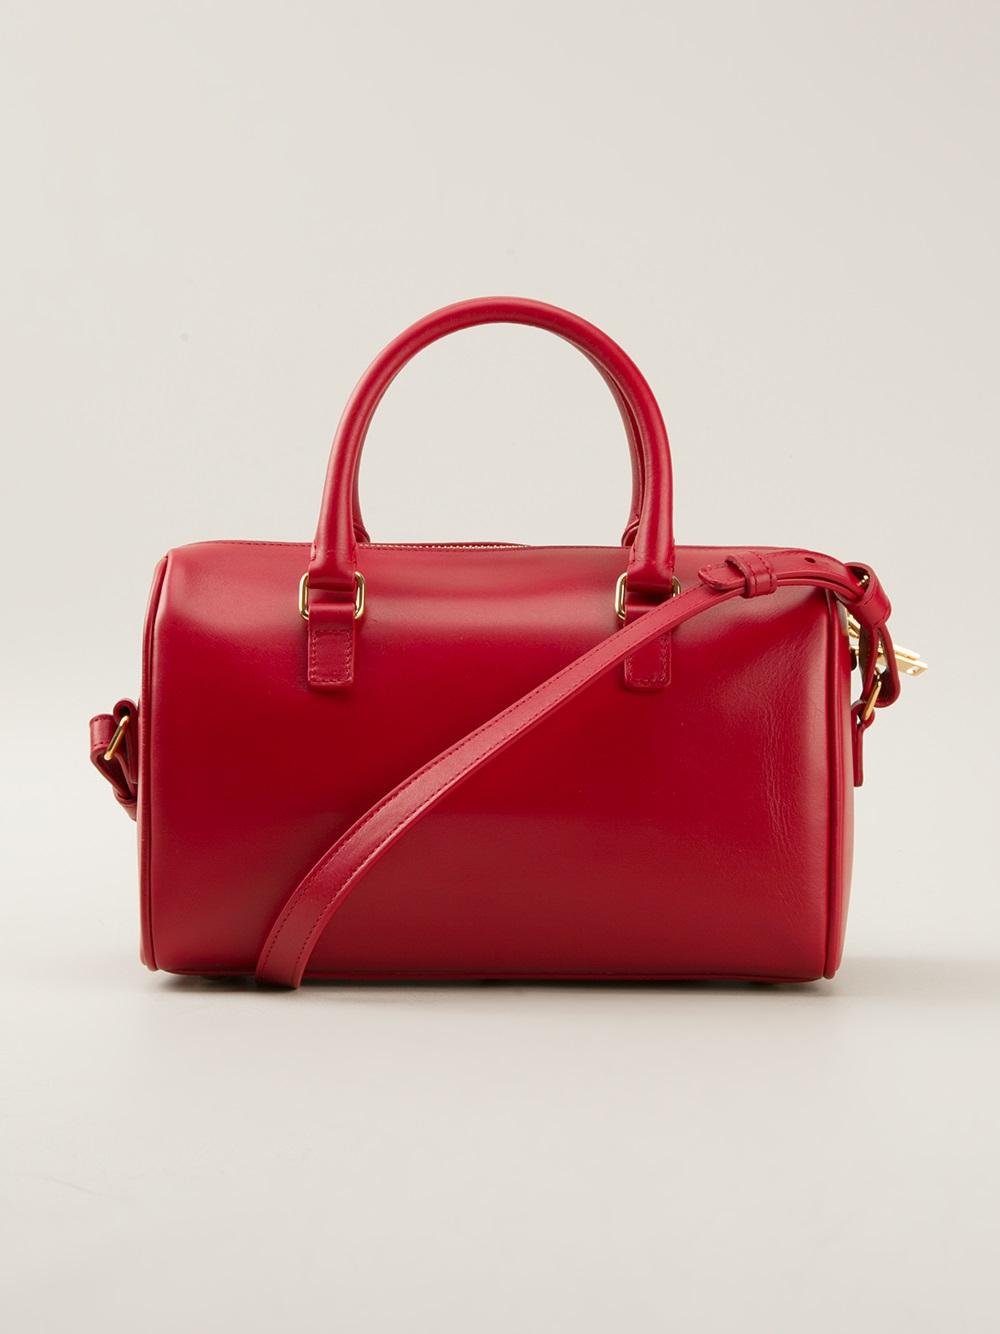 4056b6c343b4 Lyst - Saint Laurent Classic Baby Duffle Bag in Red